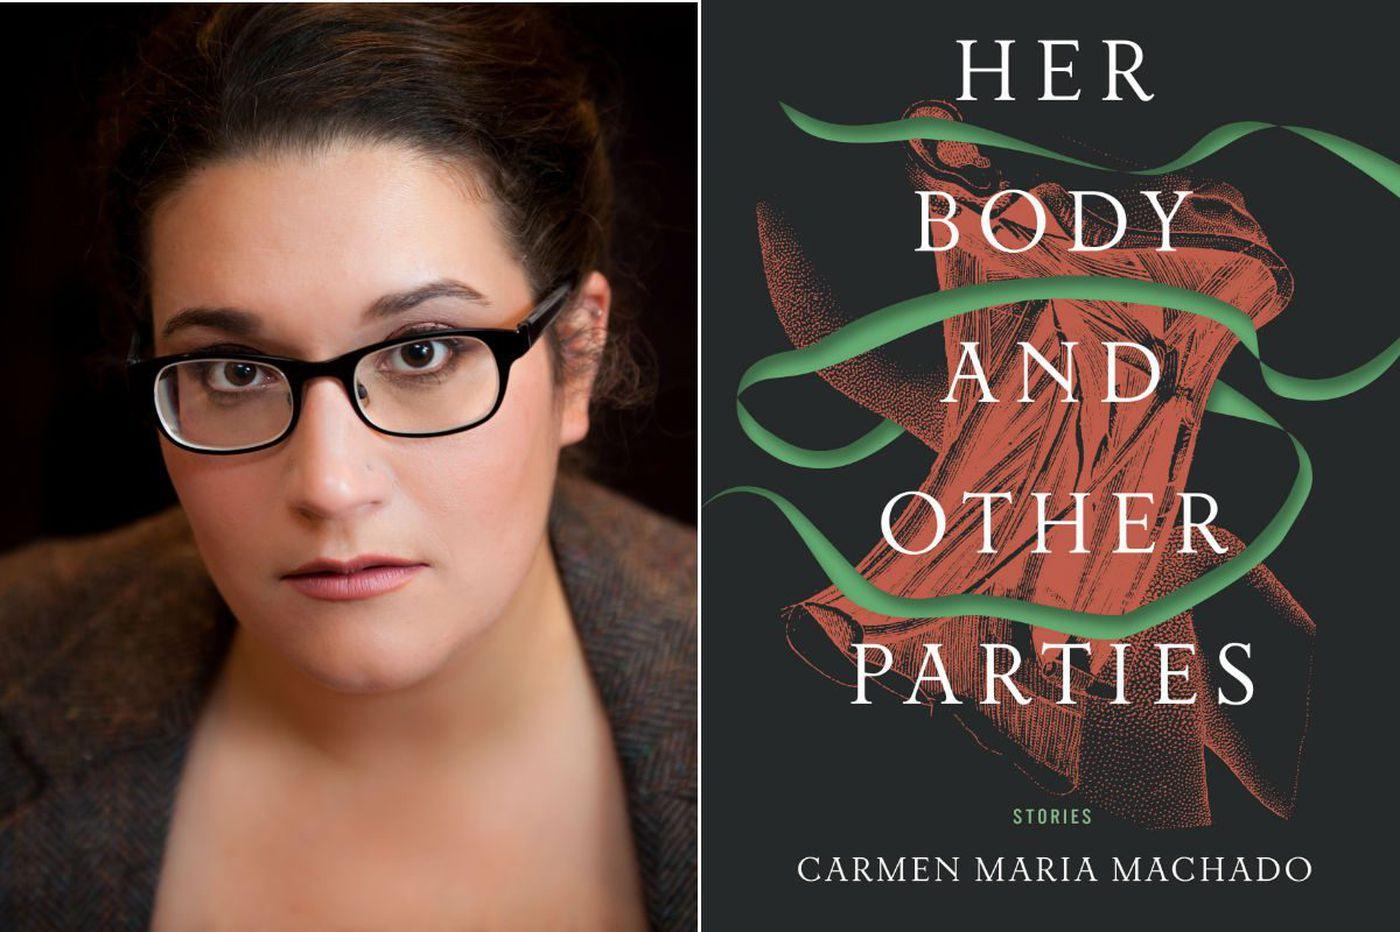 Carmen Maria Machado: 'Her Body,' ghosts, and eggnog